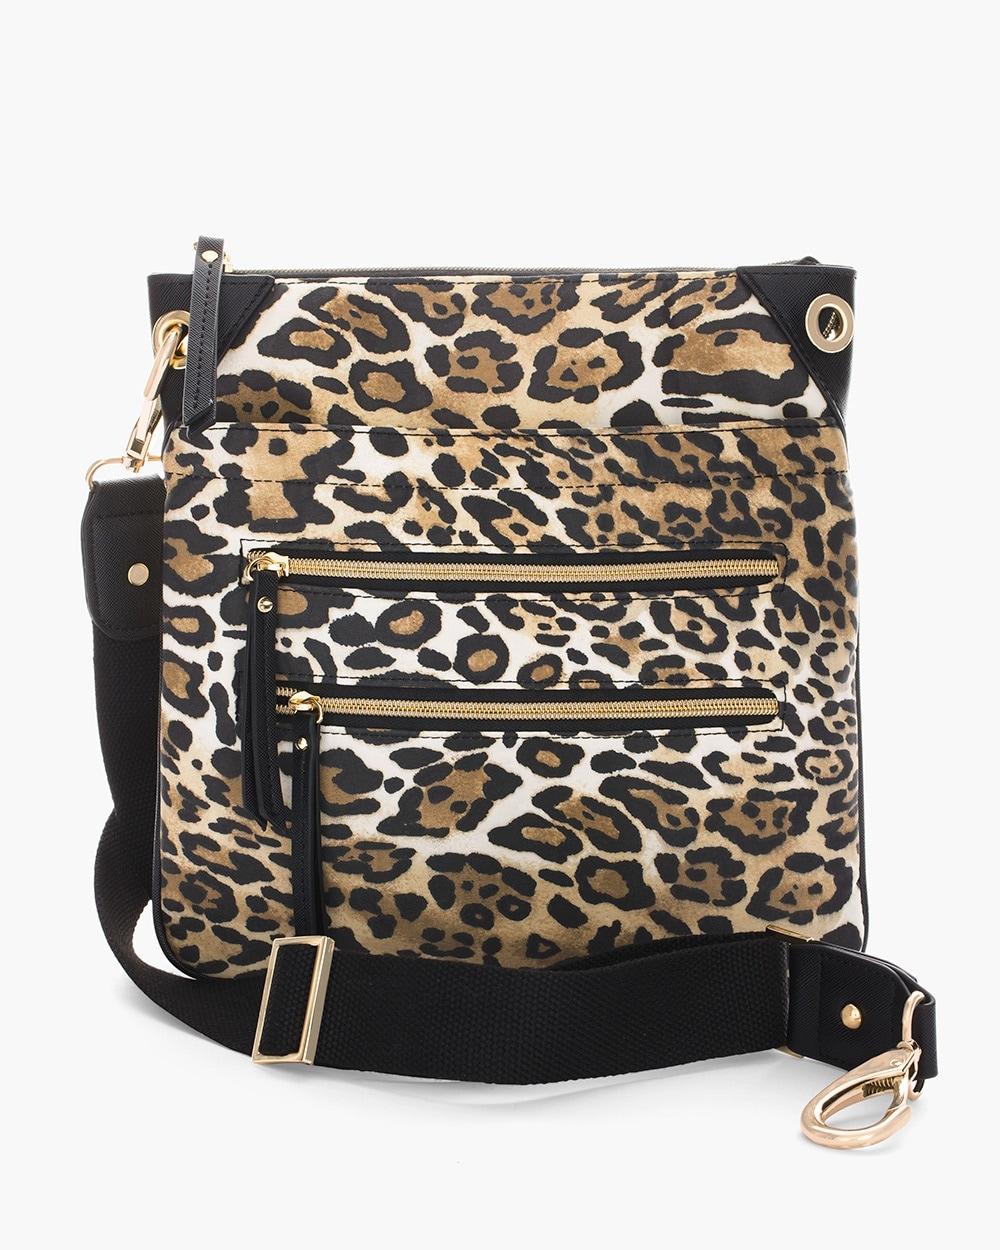 Cheetah Crossbody Bag - Chico s c3fe3f2ec43ed